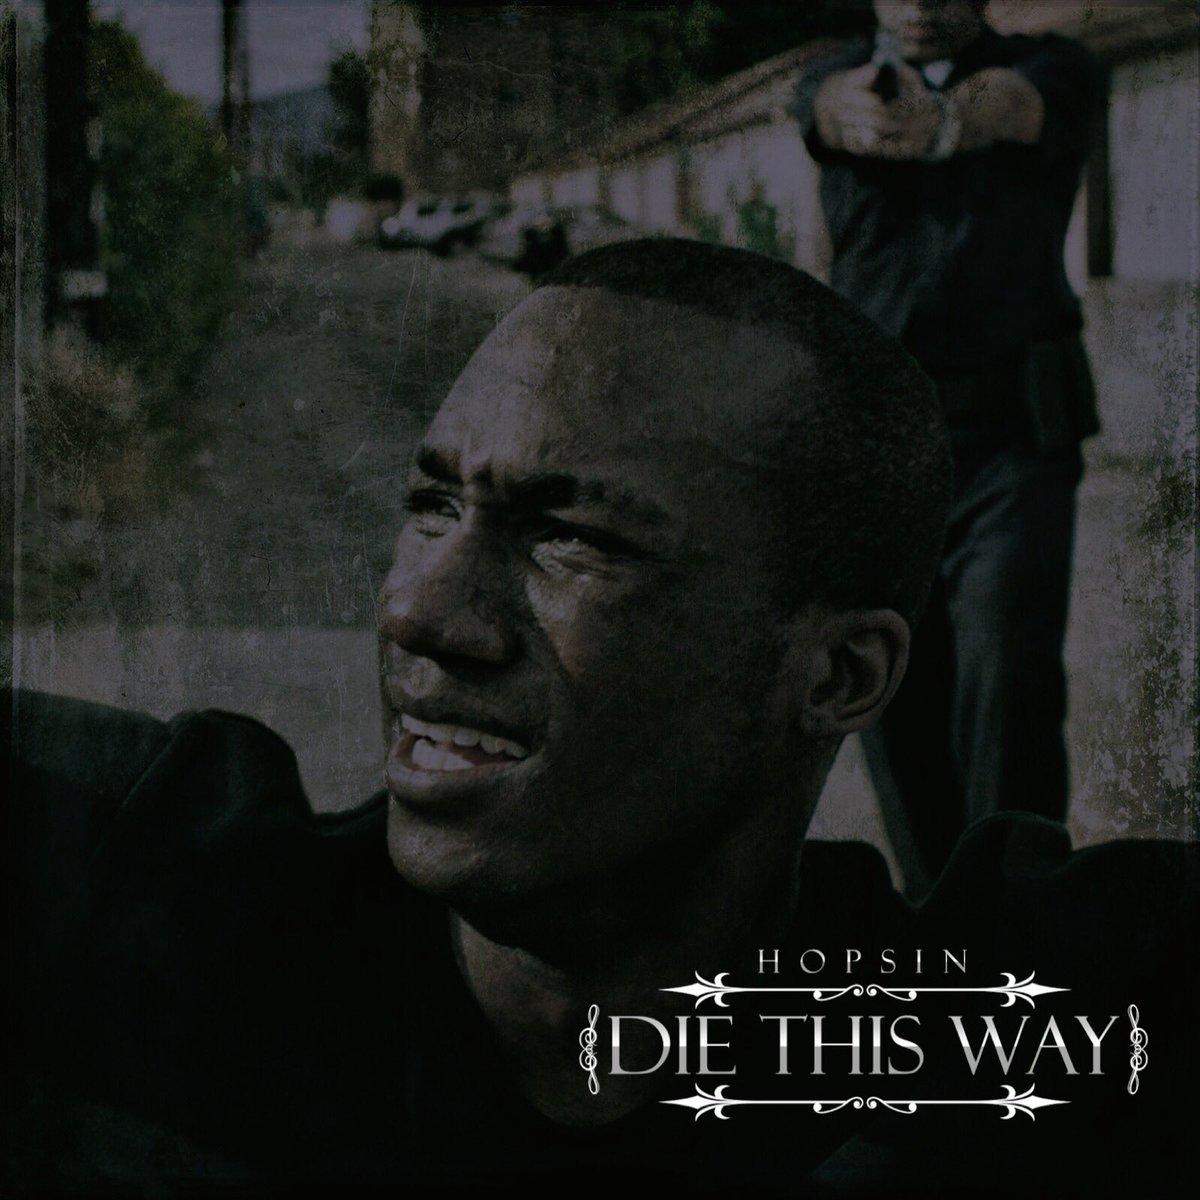 hopsin on die this way will be released